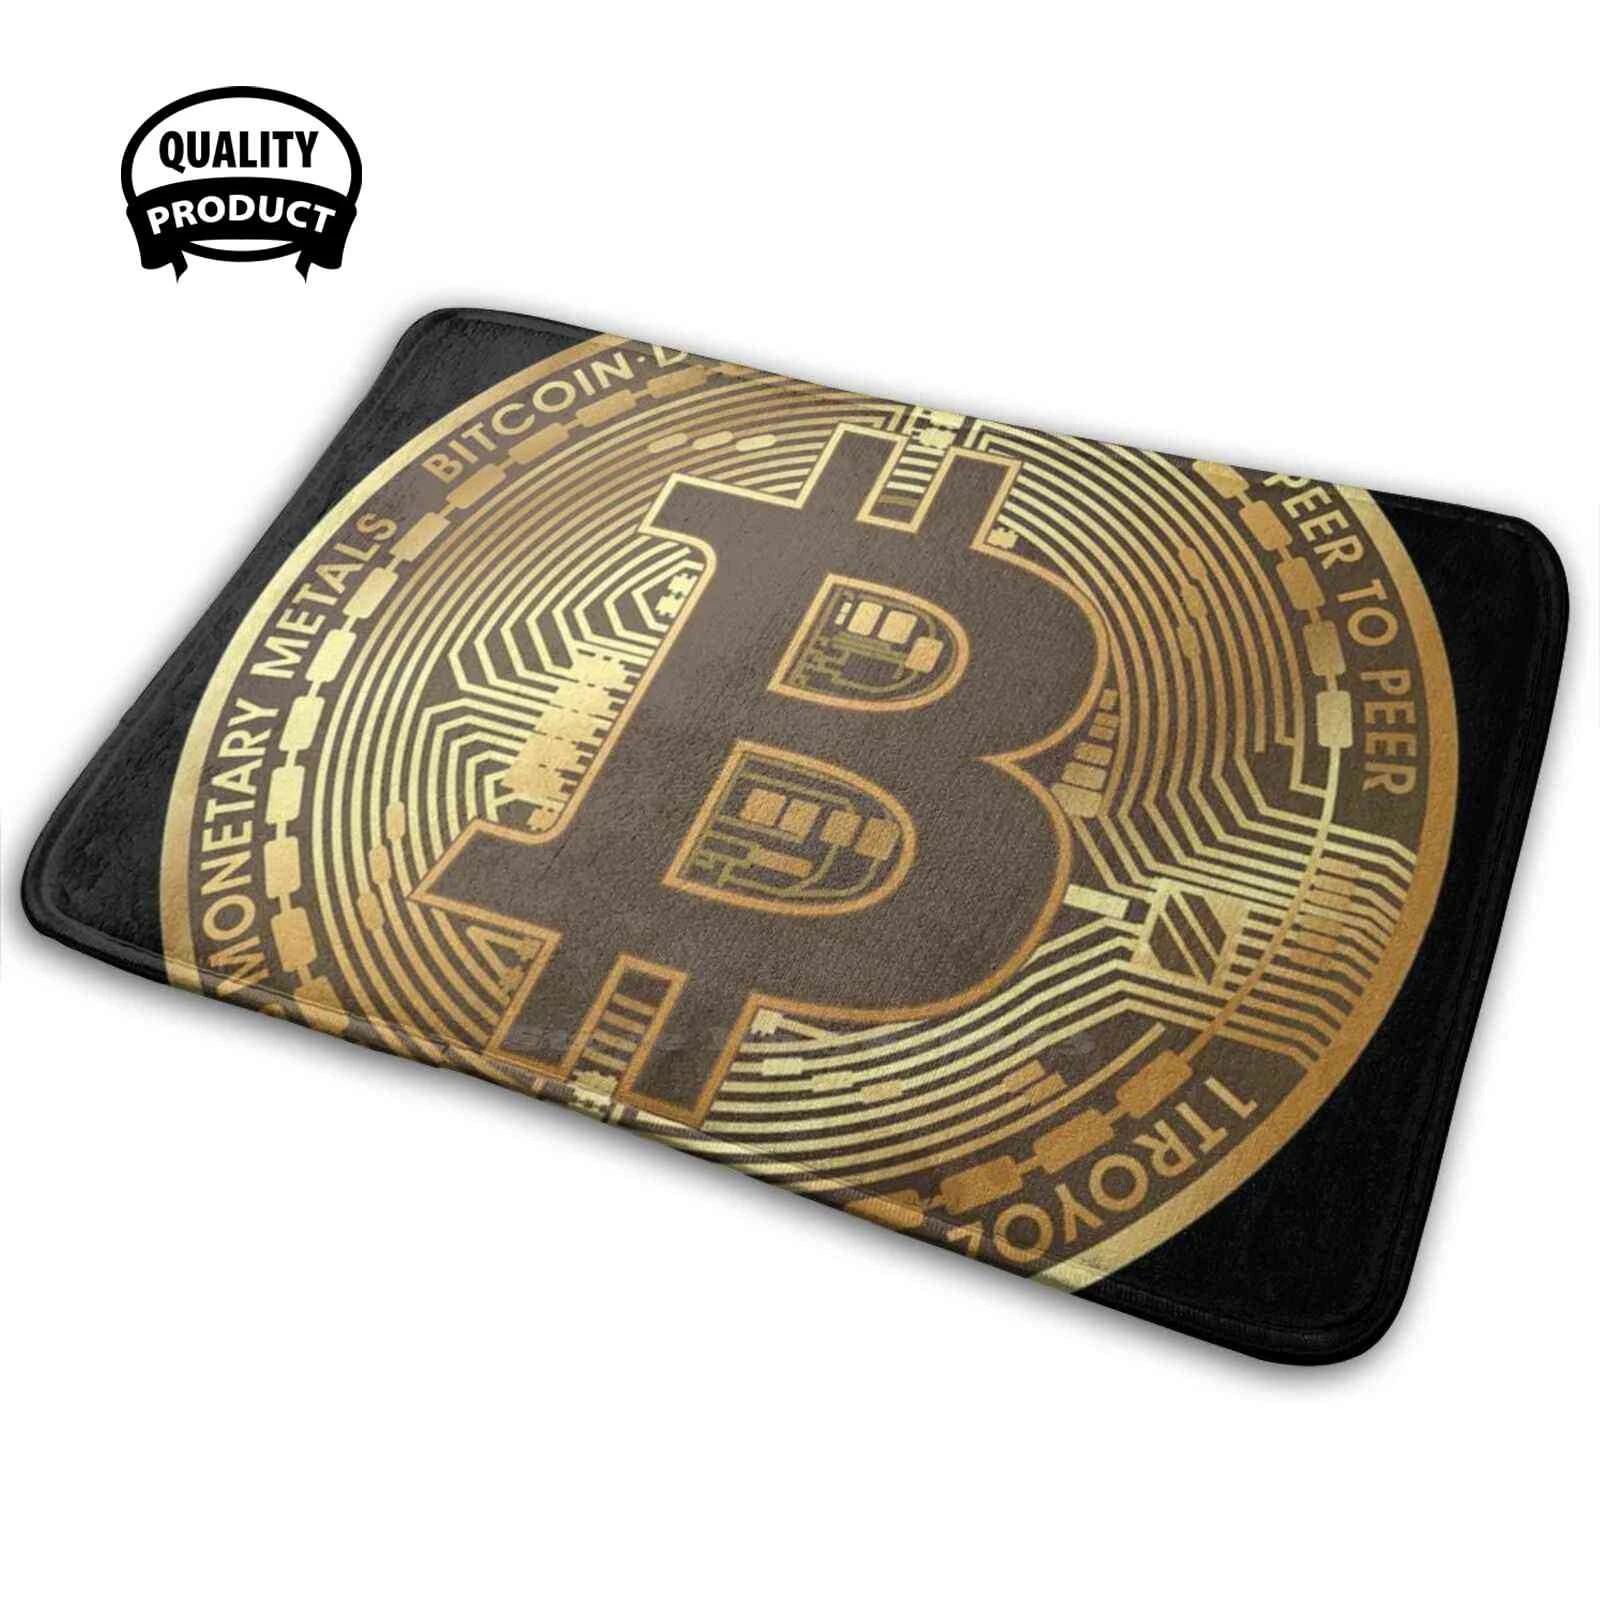 Penny 3d Soft Non Slip Mat Rug Carpet Cushion Bitcoin Btc Btc Today Btc Price Btc News Bitcoin News Bitcoin News Today Bitcoin Mat Aliexpress